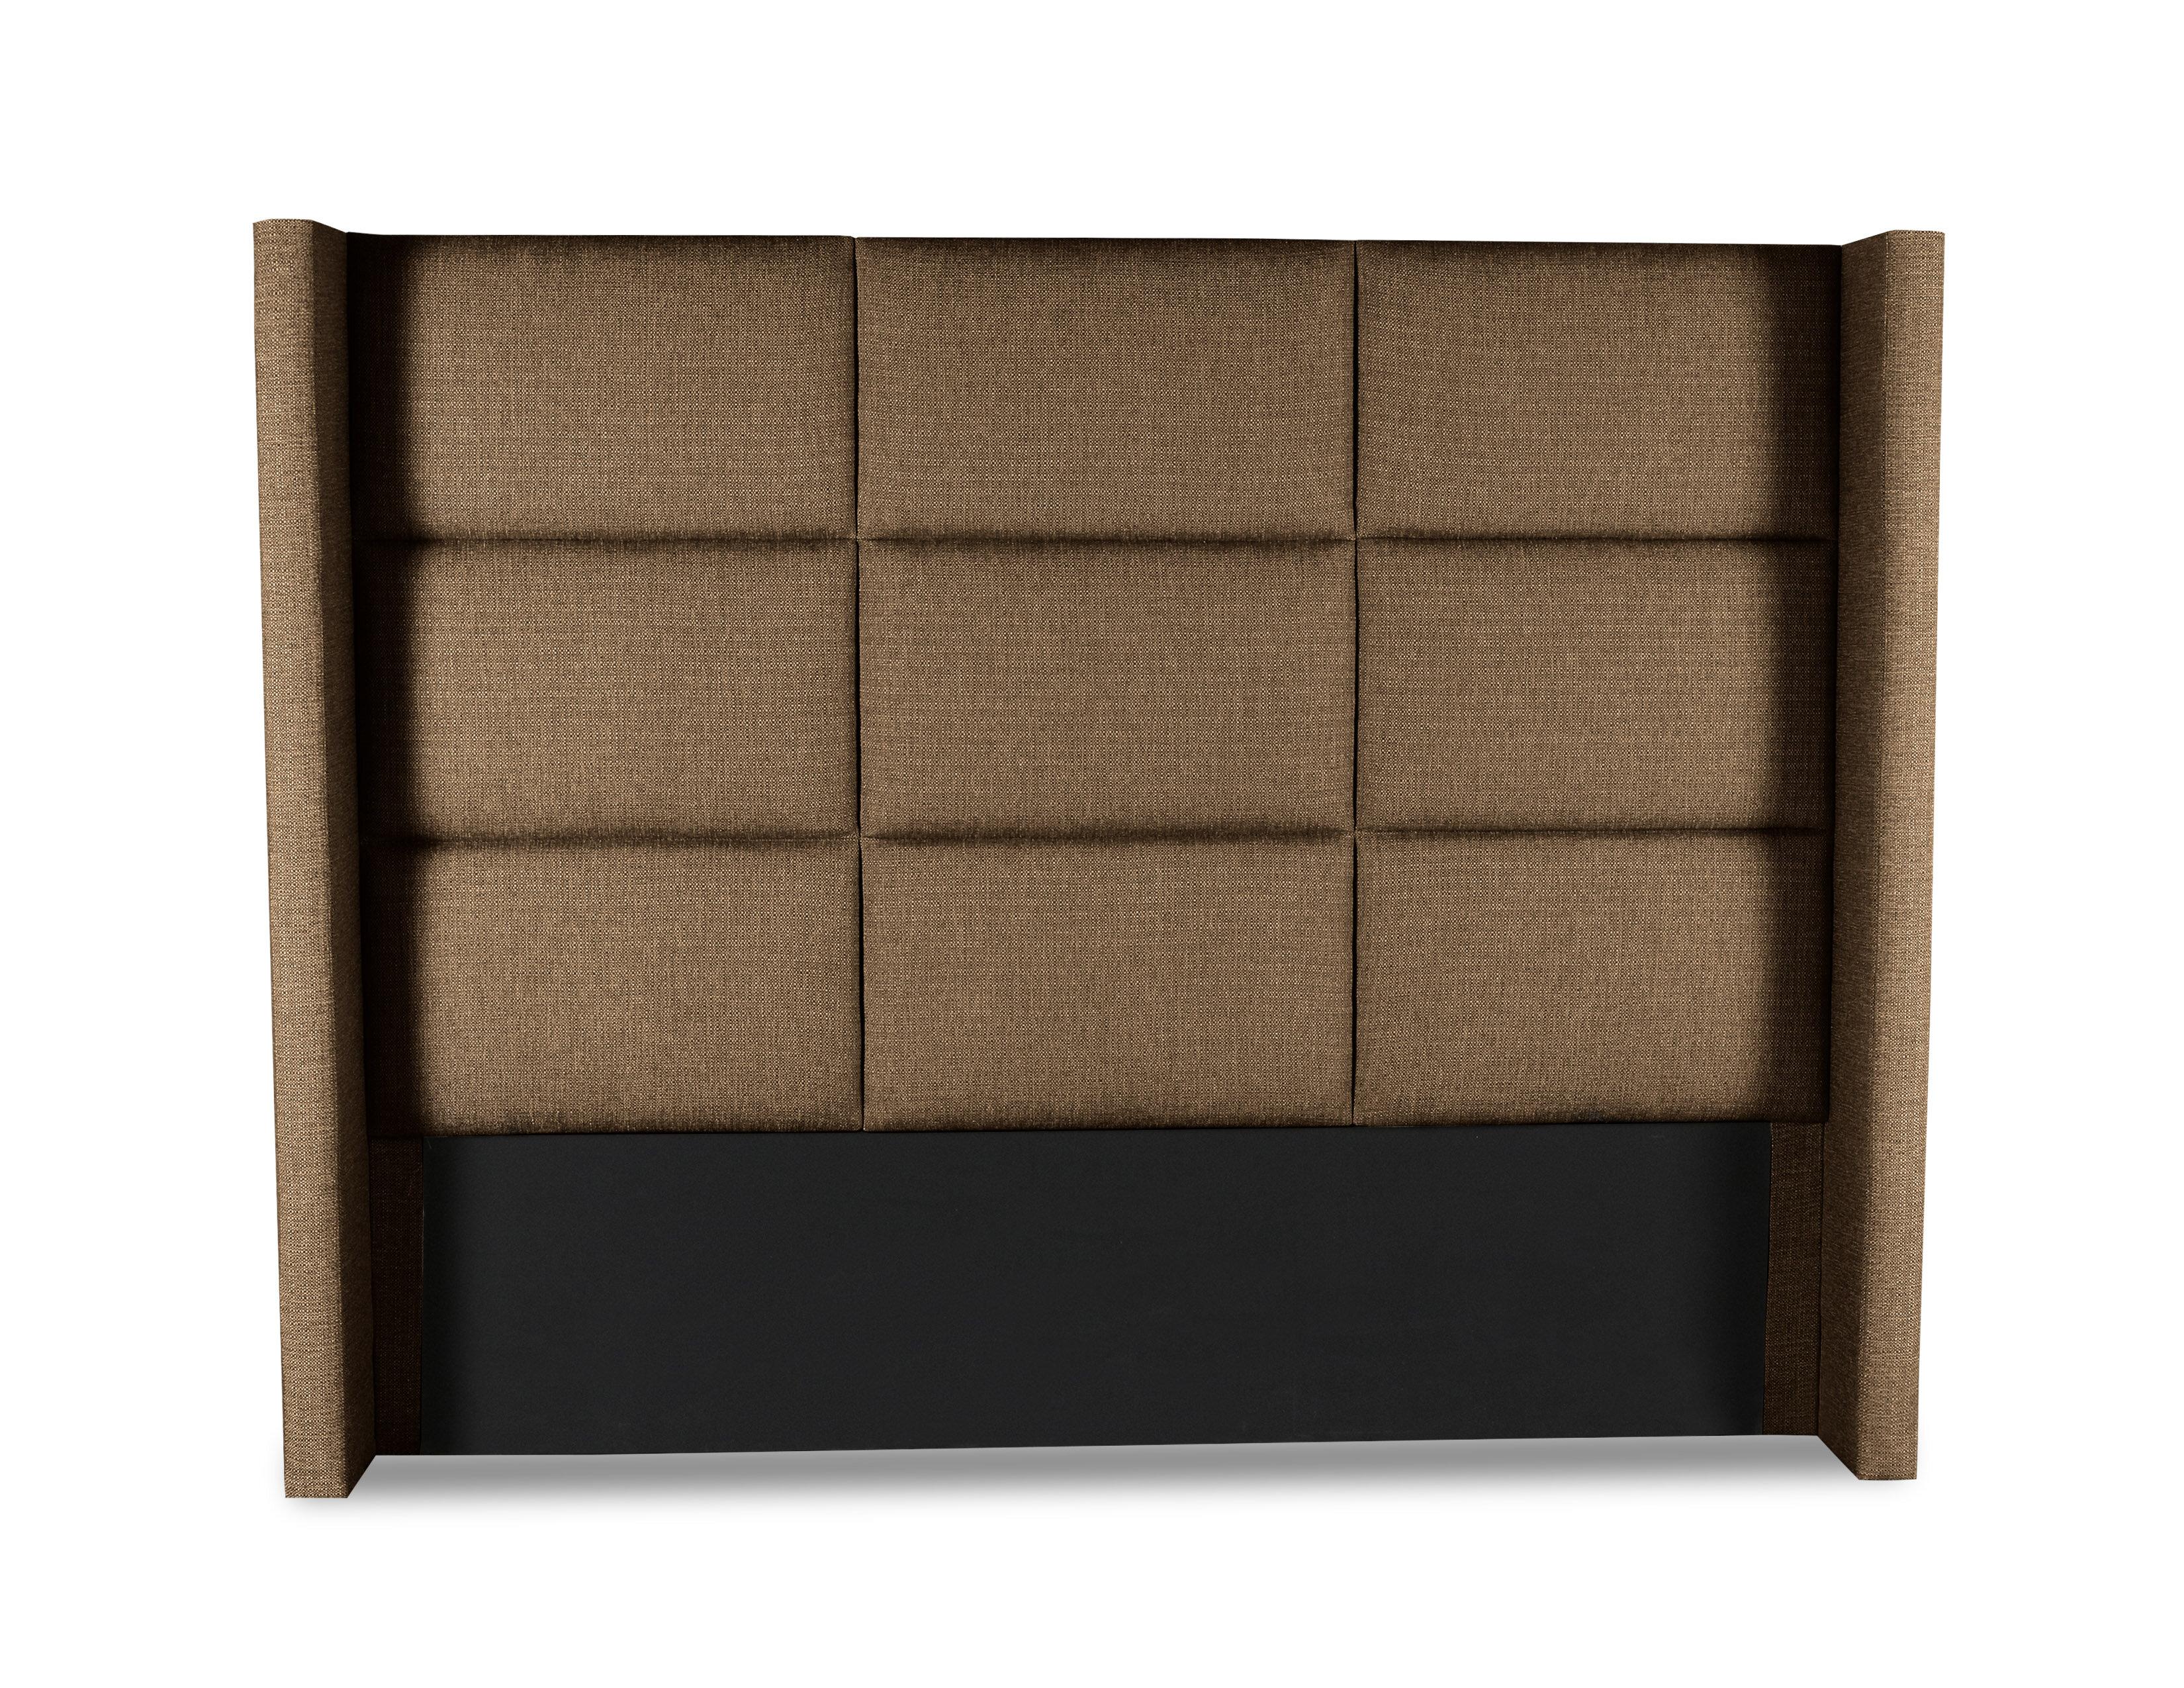 Wayfair Tufted Headboard Tufted Headboard In Bedroom: Brayden Studio Hansen Square Tufted Upholstered Wingback